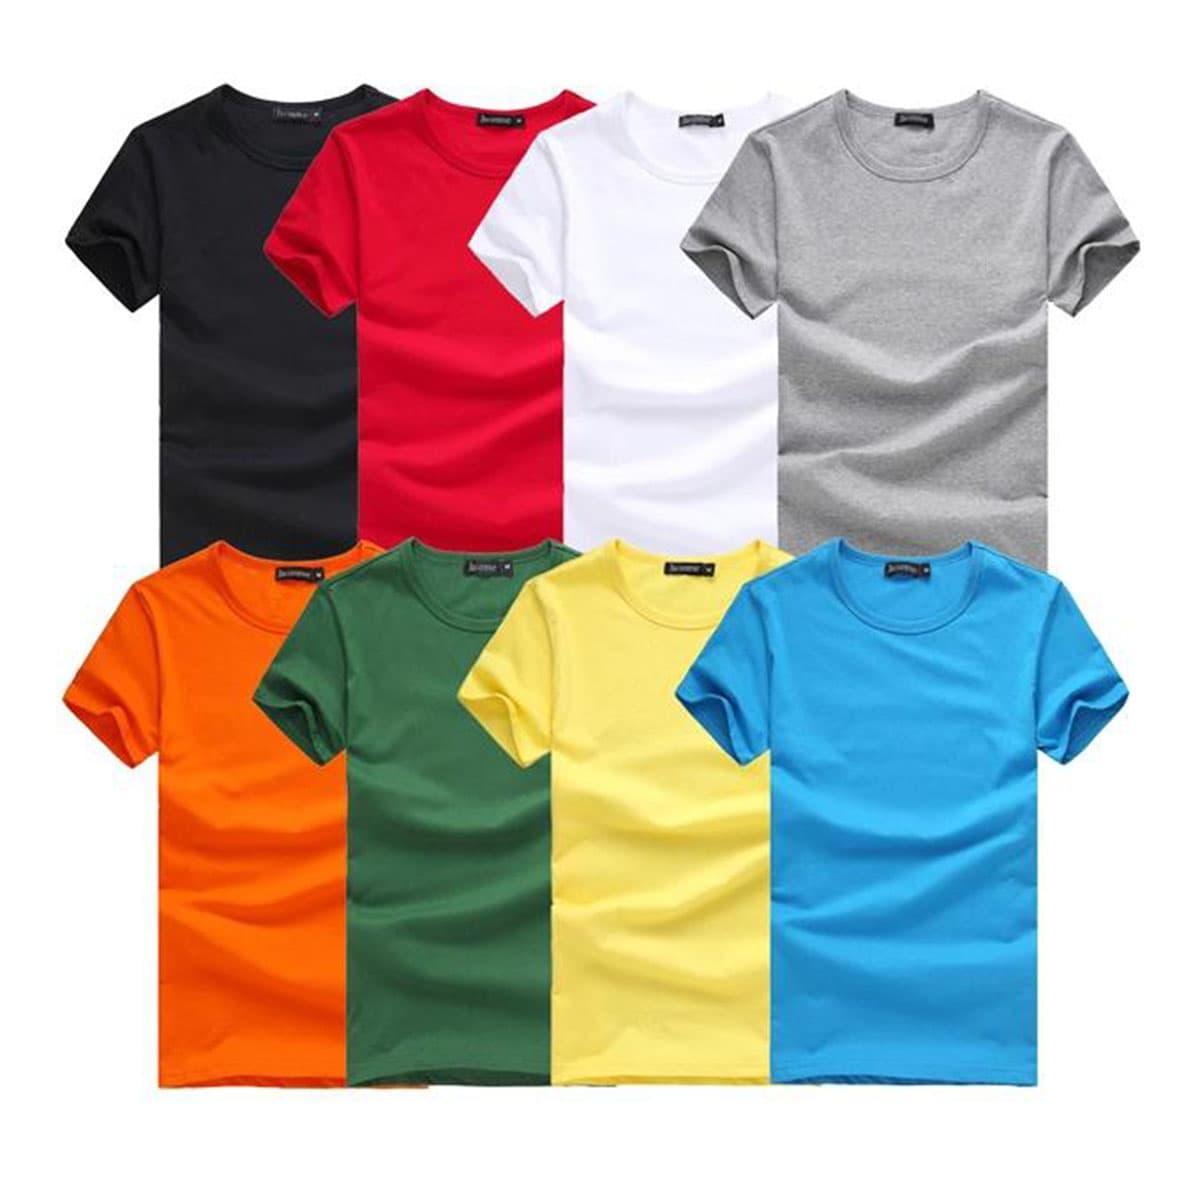 Mens T Shirts Online Buy T Shirts For Men In Bangladesh Daraz